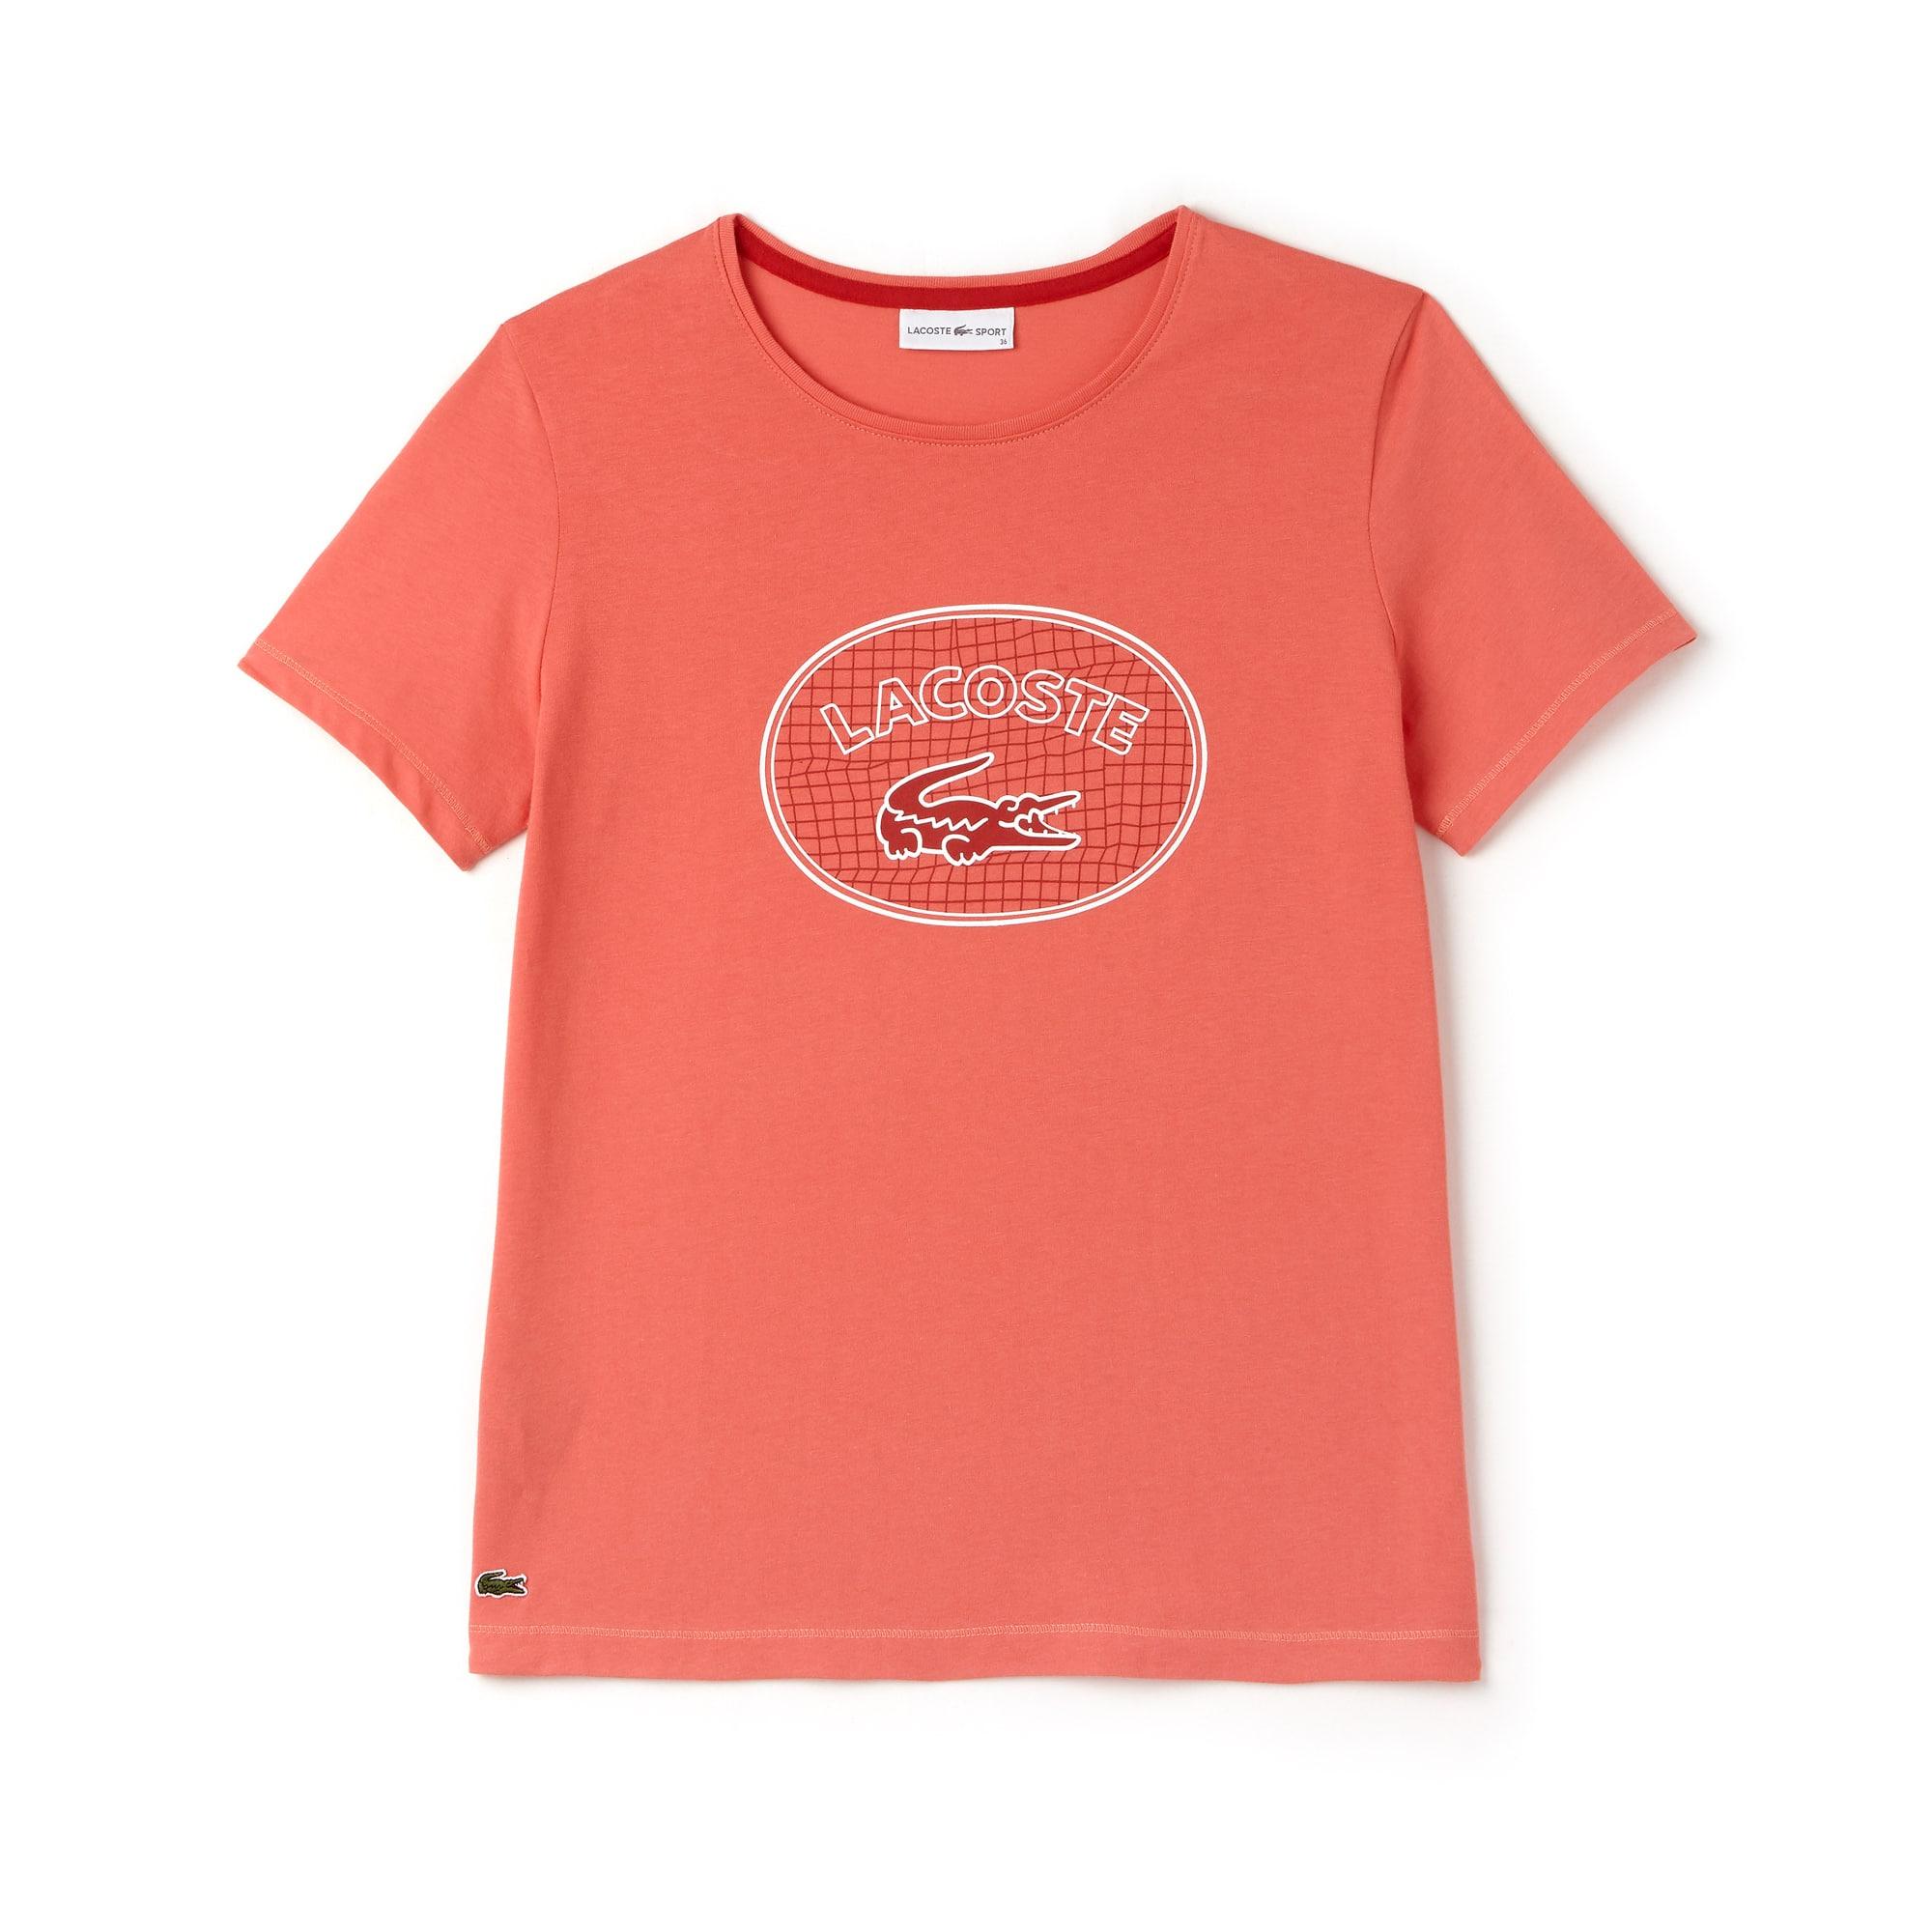 Women's Lacoste SPORT Oversized Logo Design Jersey Tennis T-shirt